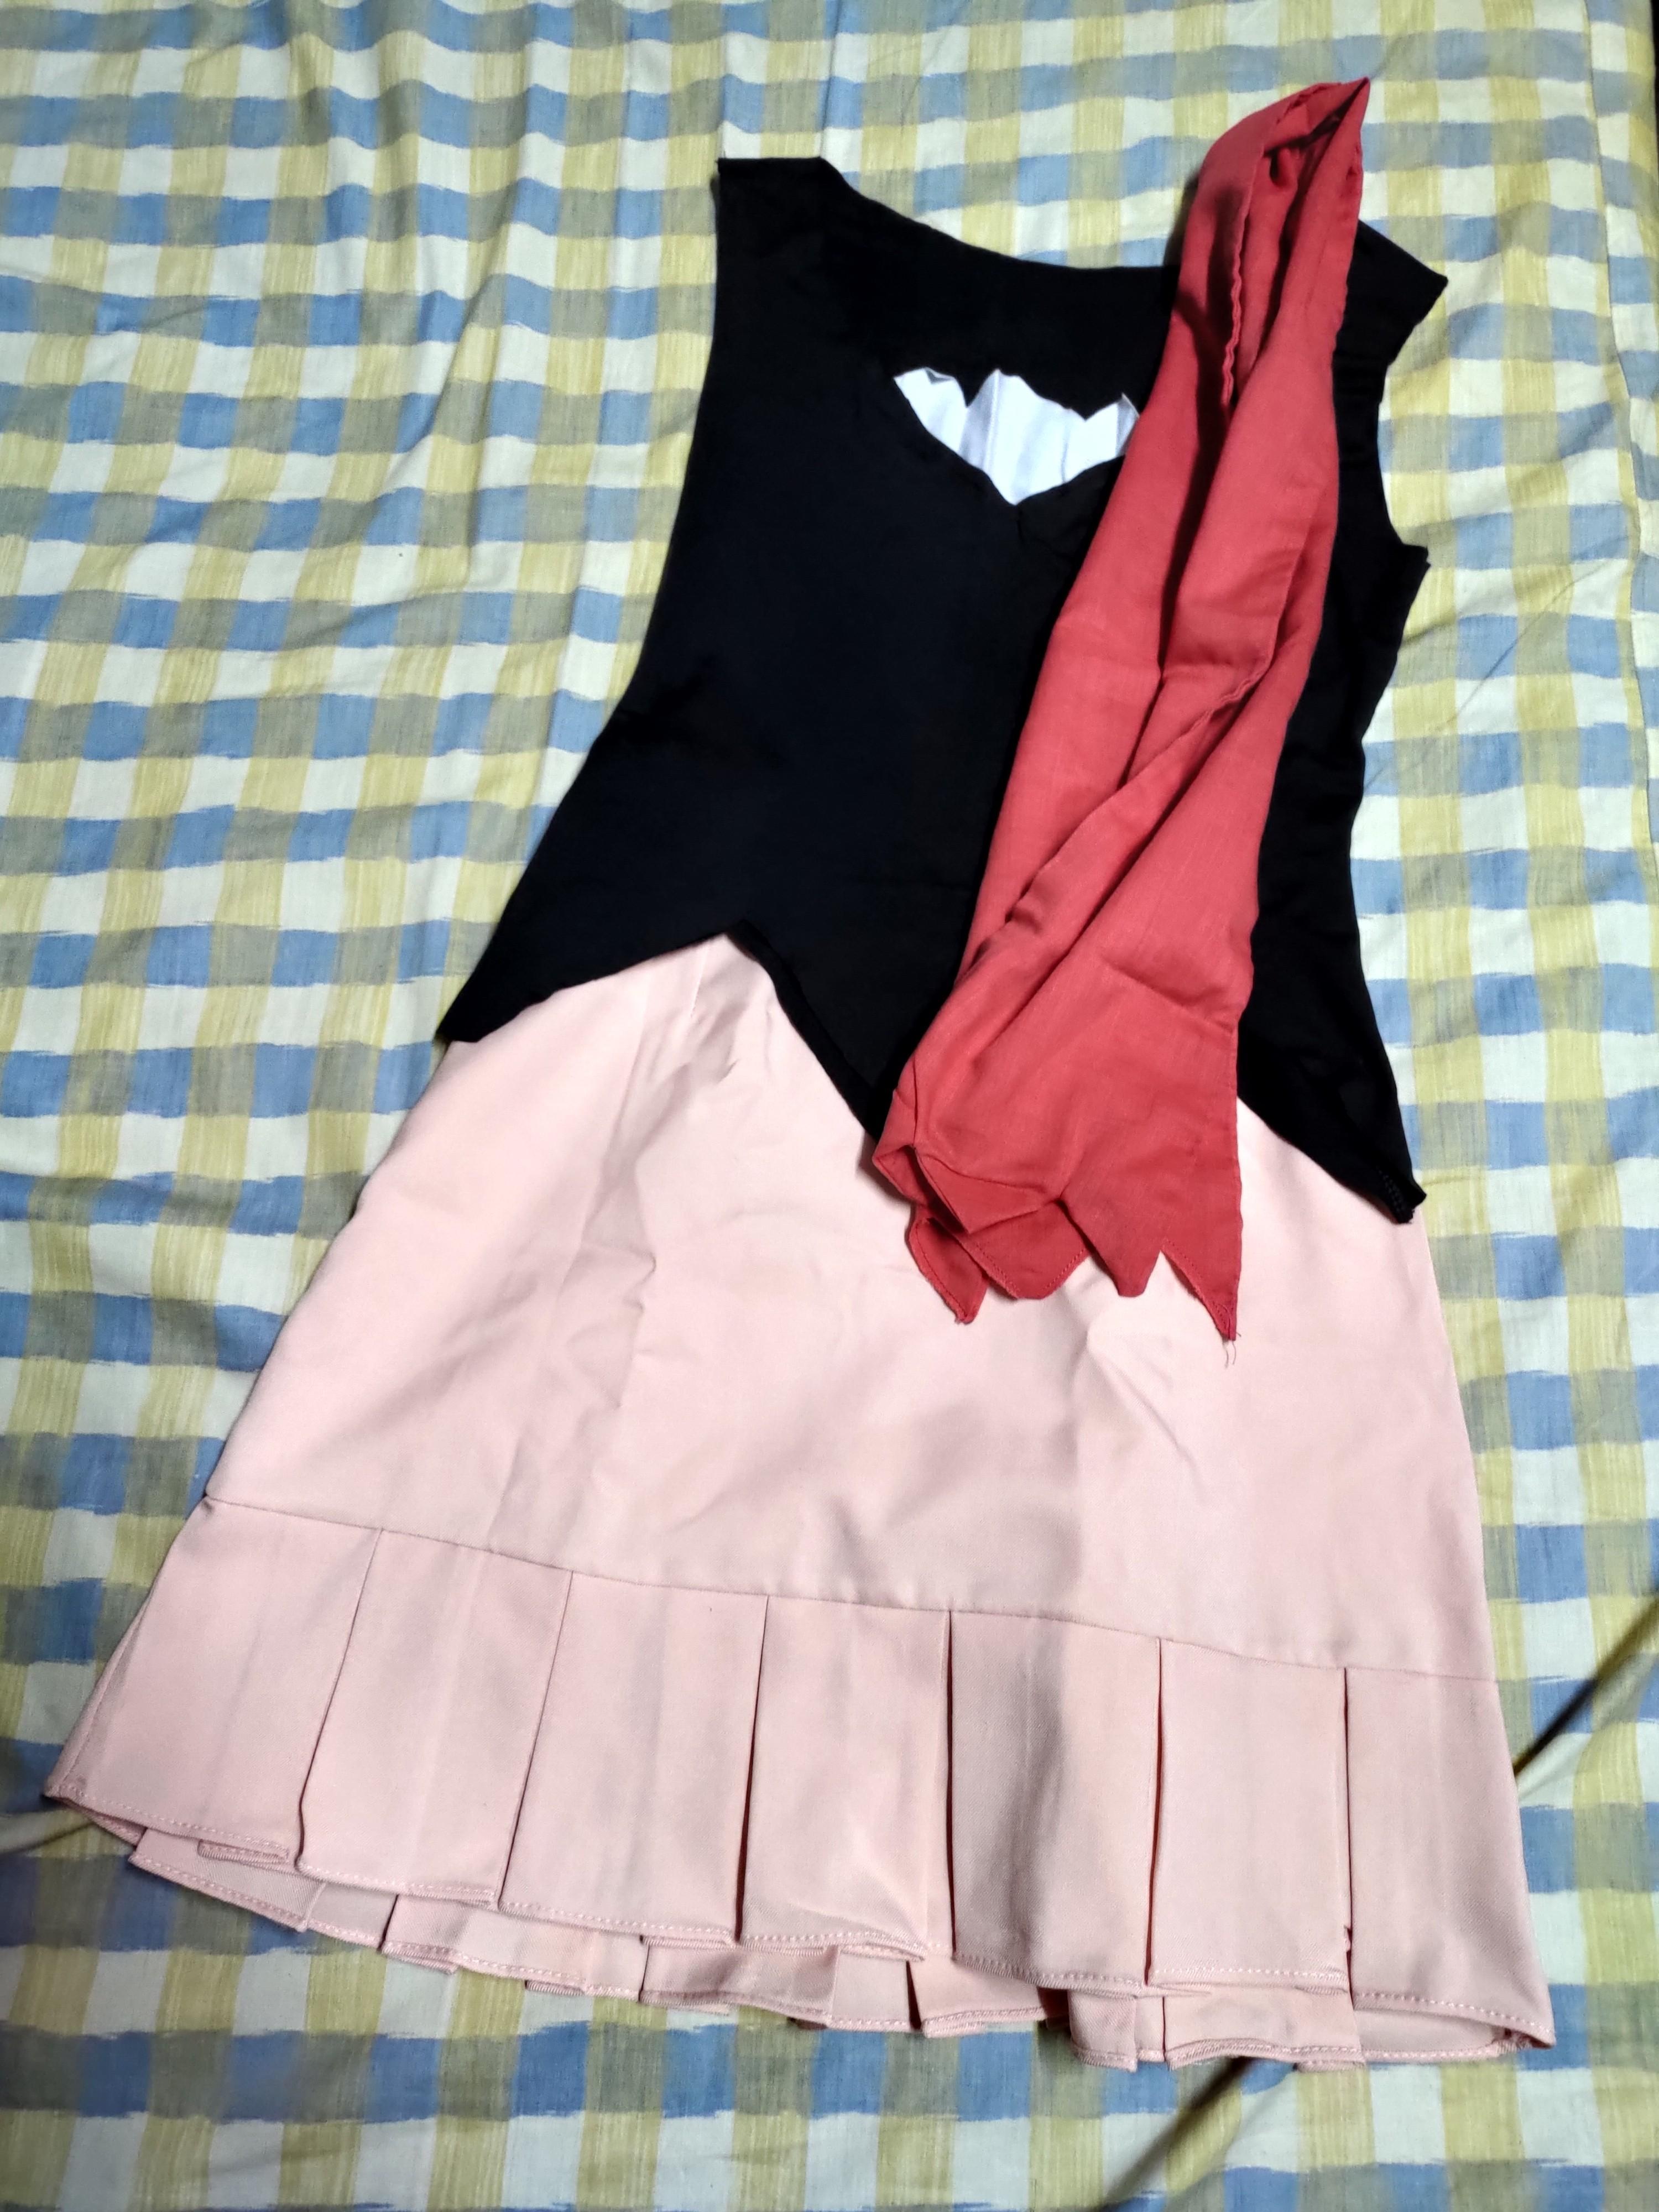 [Sell /Rent] Pokémon Dawn / Hikari Cosplay Costume set